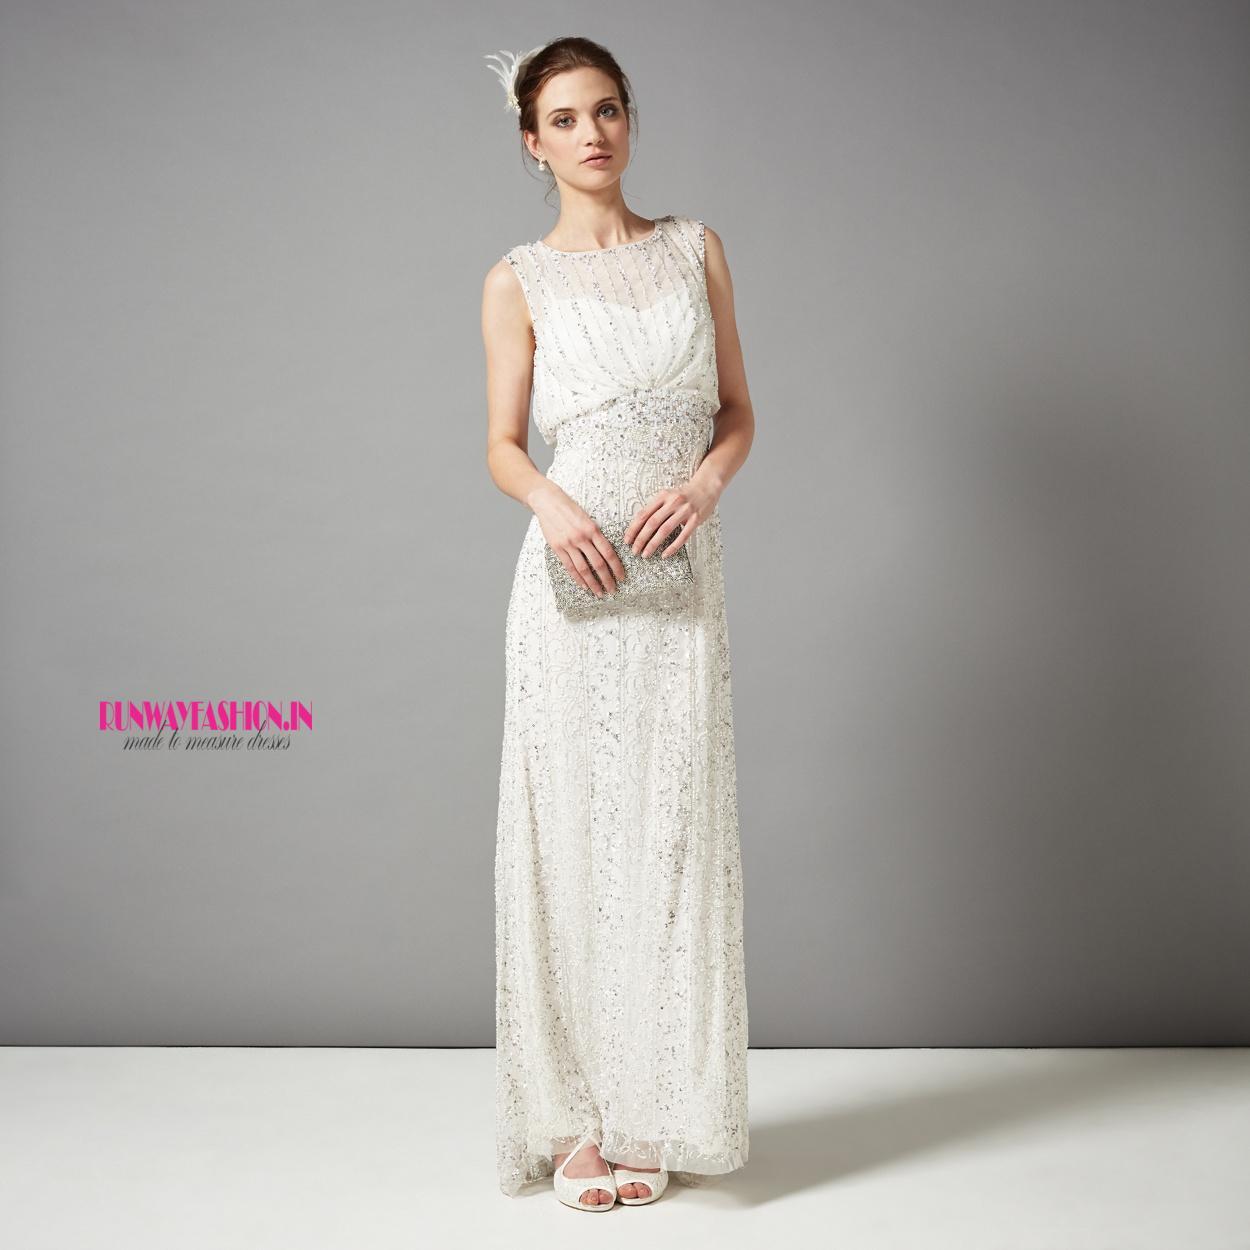 Wedding dresses runway fashion tailor made dresses cocktail wedding dresses ombrellifo Image collections